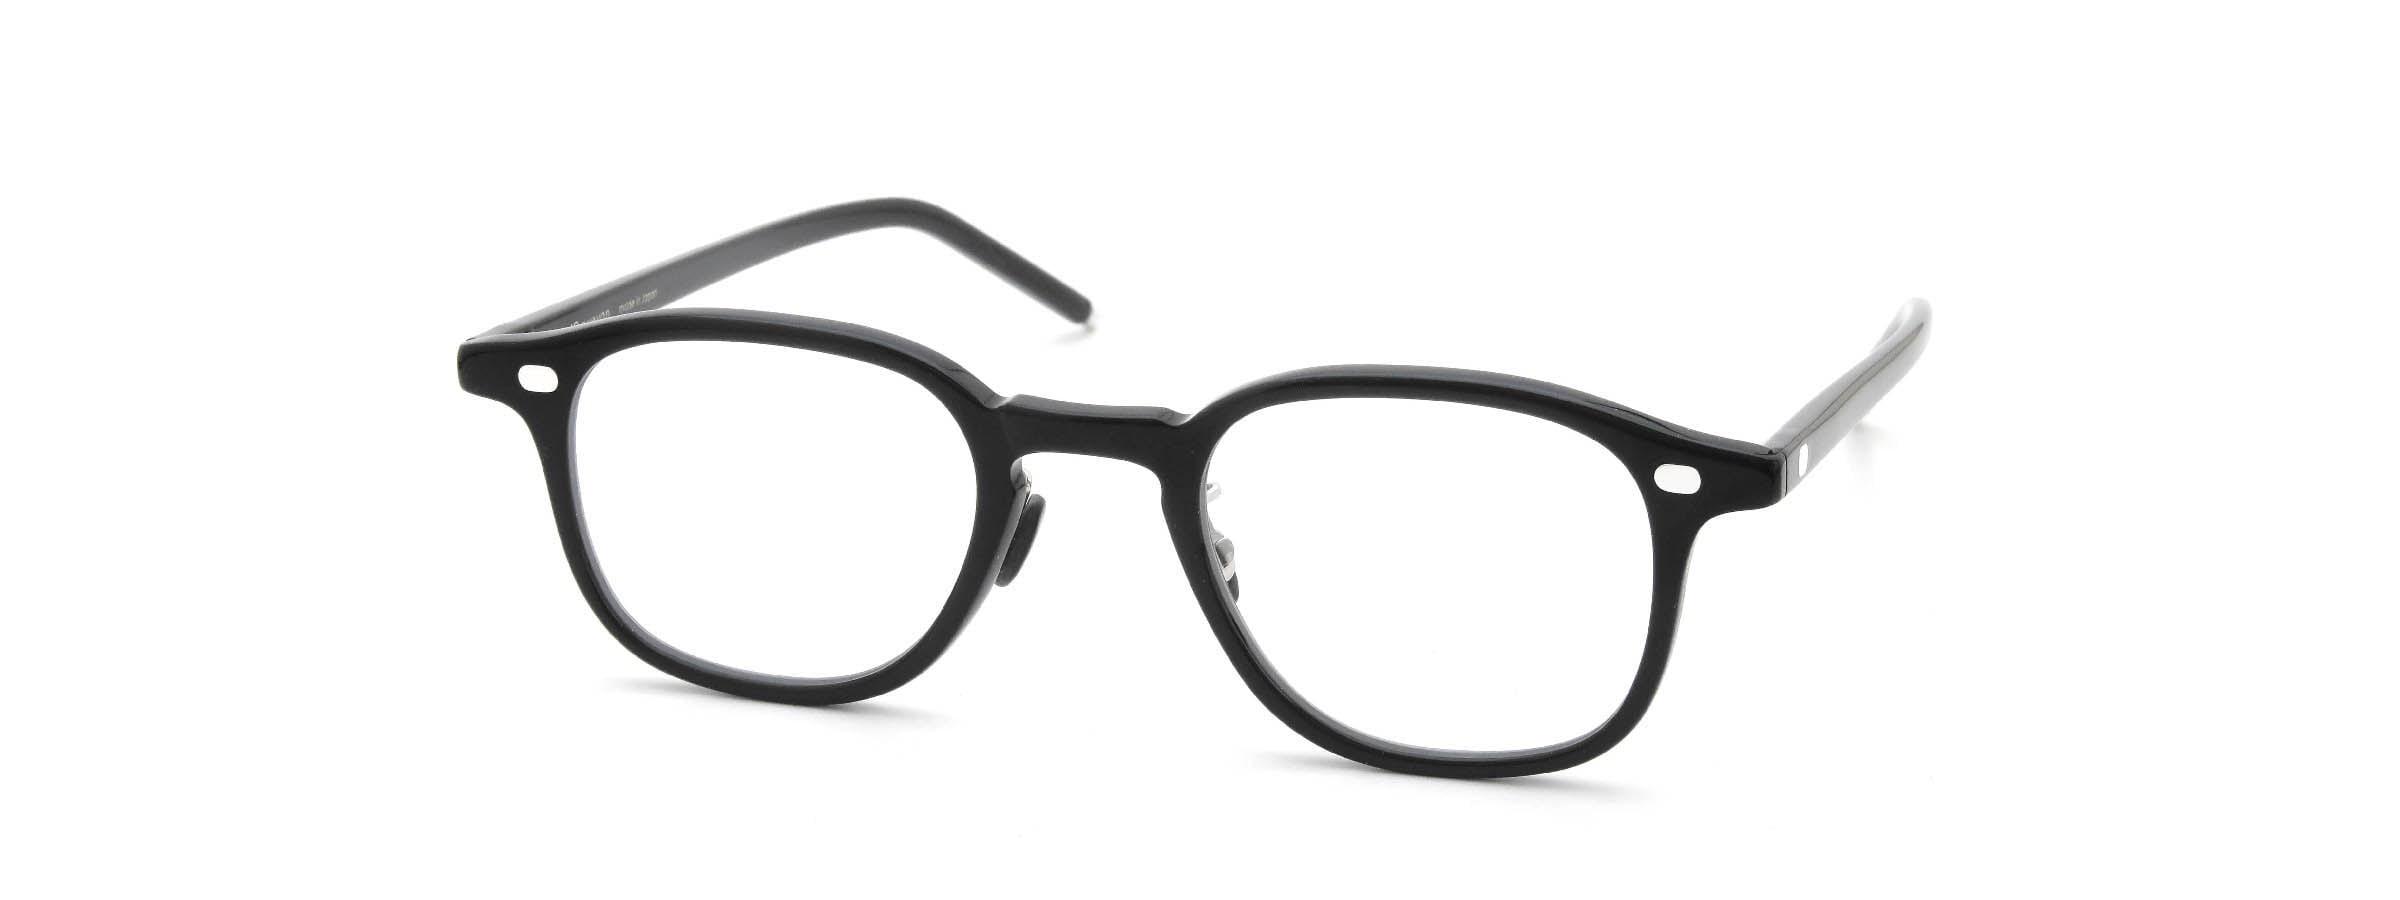 10 eyevan NO.7 Ⅲ 45size